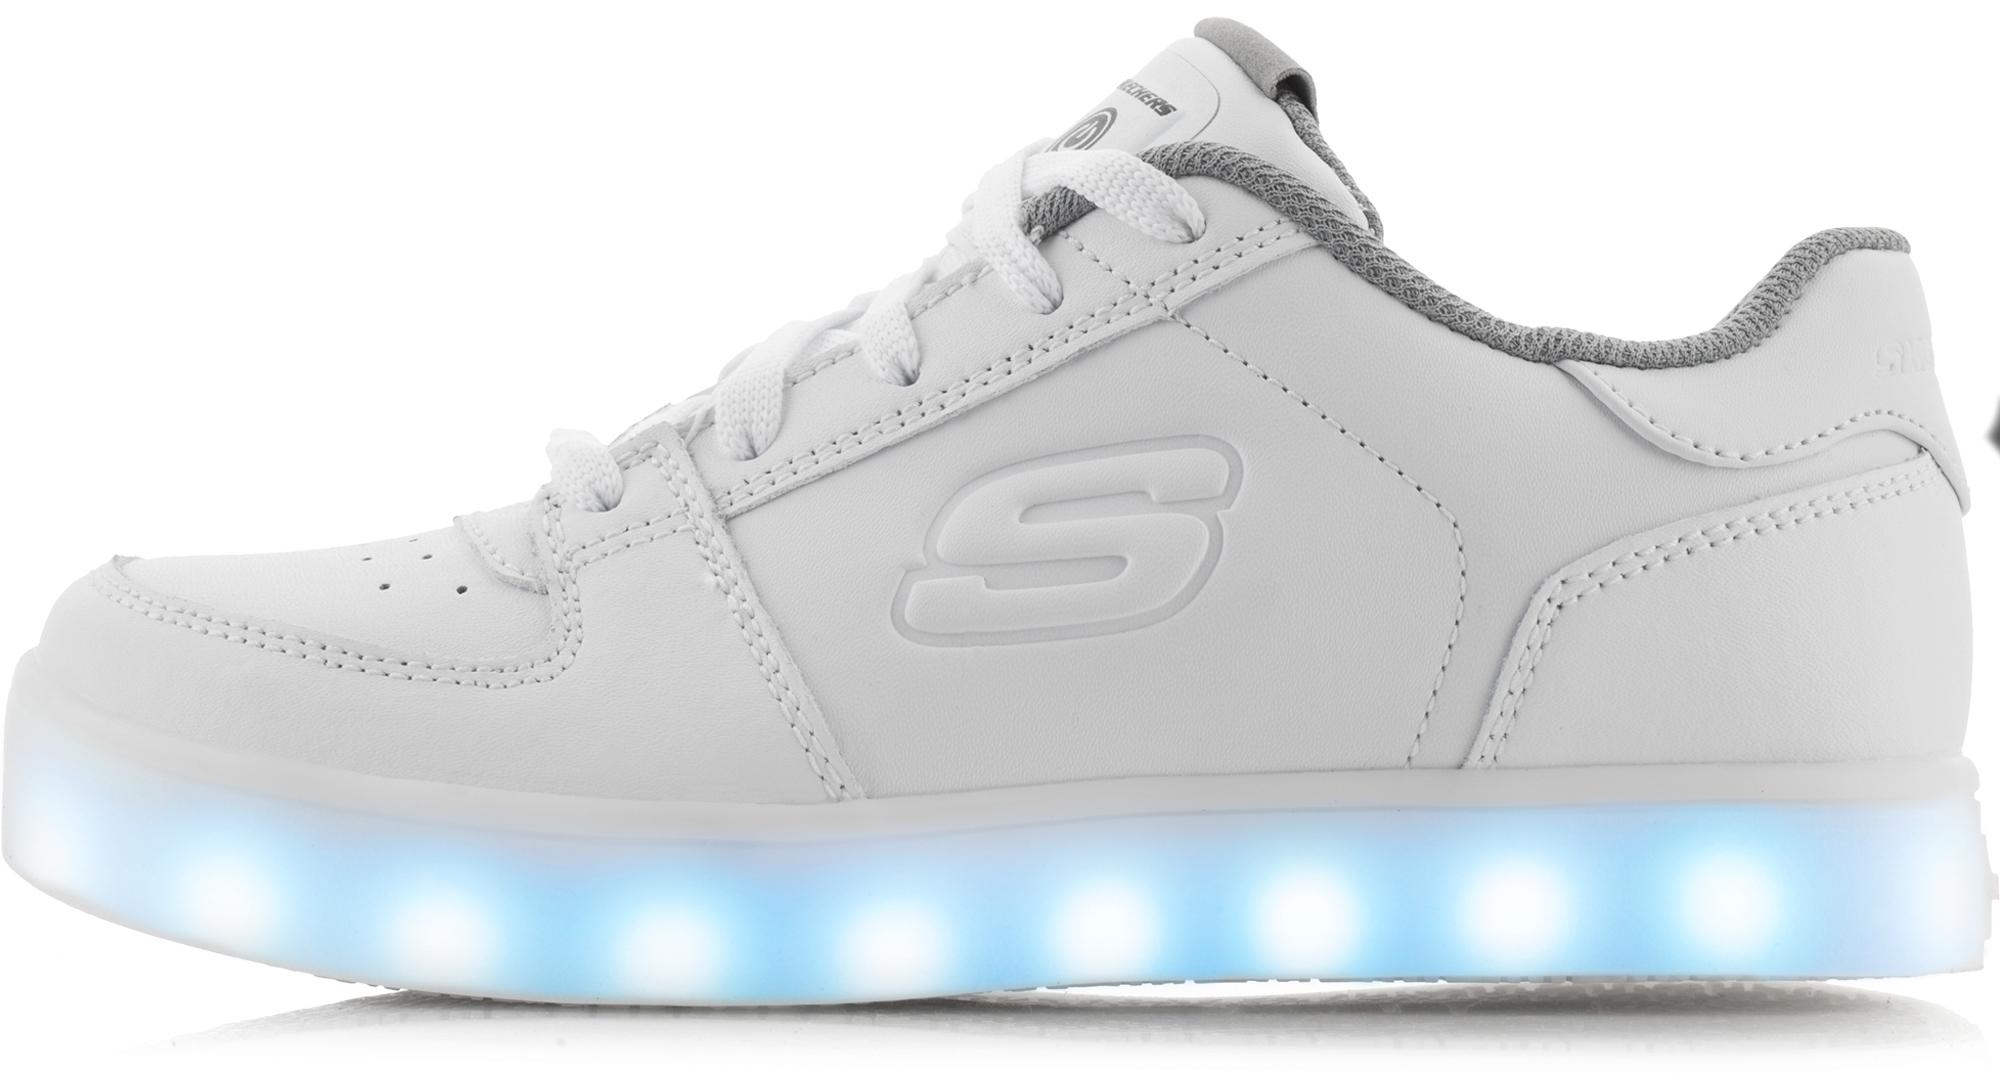 Skechers Кеды детские Skechers Energy Lights- Elate skechers energy lights купить